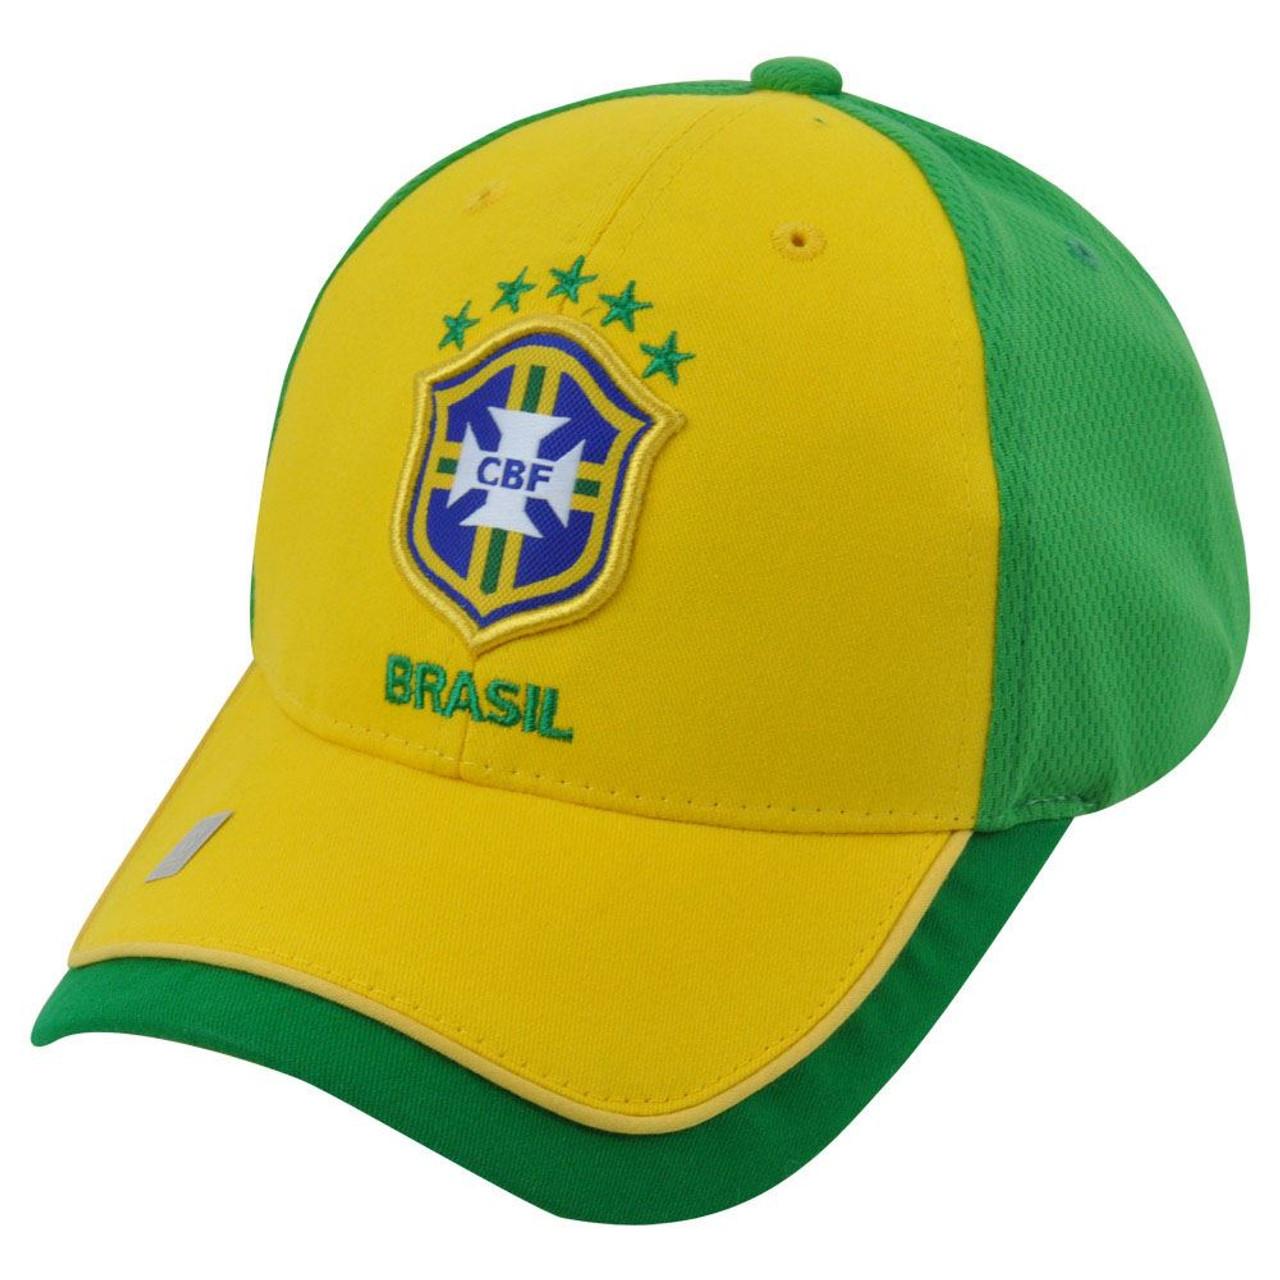 Rhinox World Cup Soccer Brazil Scarf